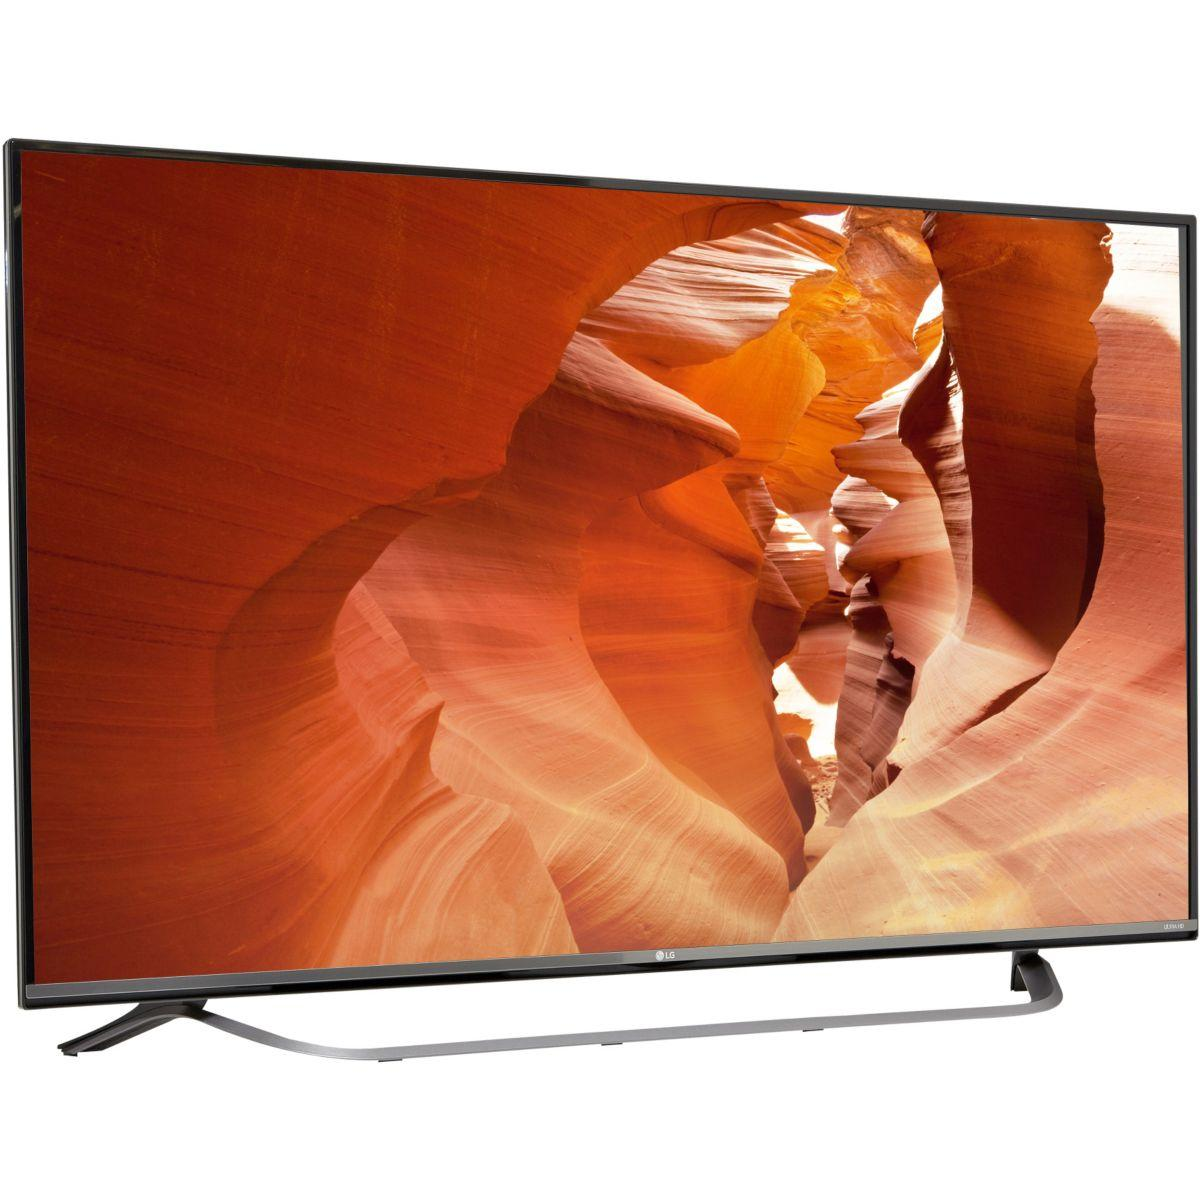 TV LG 60UF778V 4K 900Hz UCI SMART TV